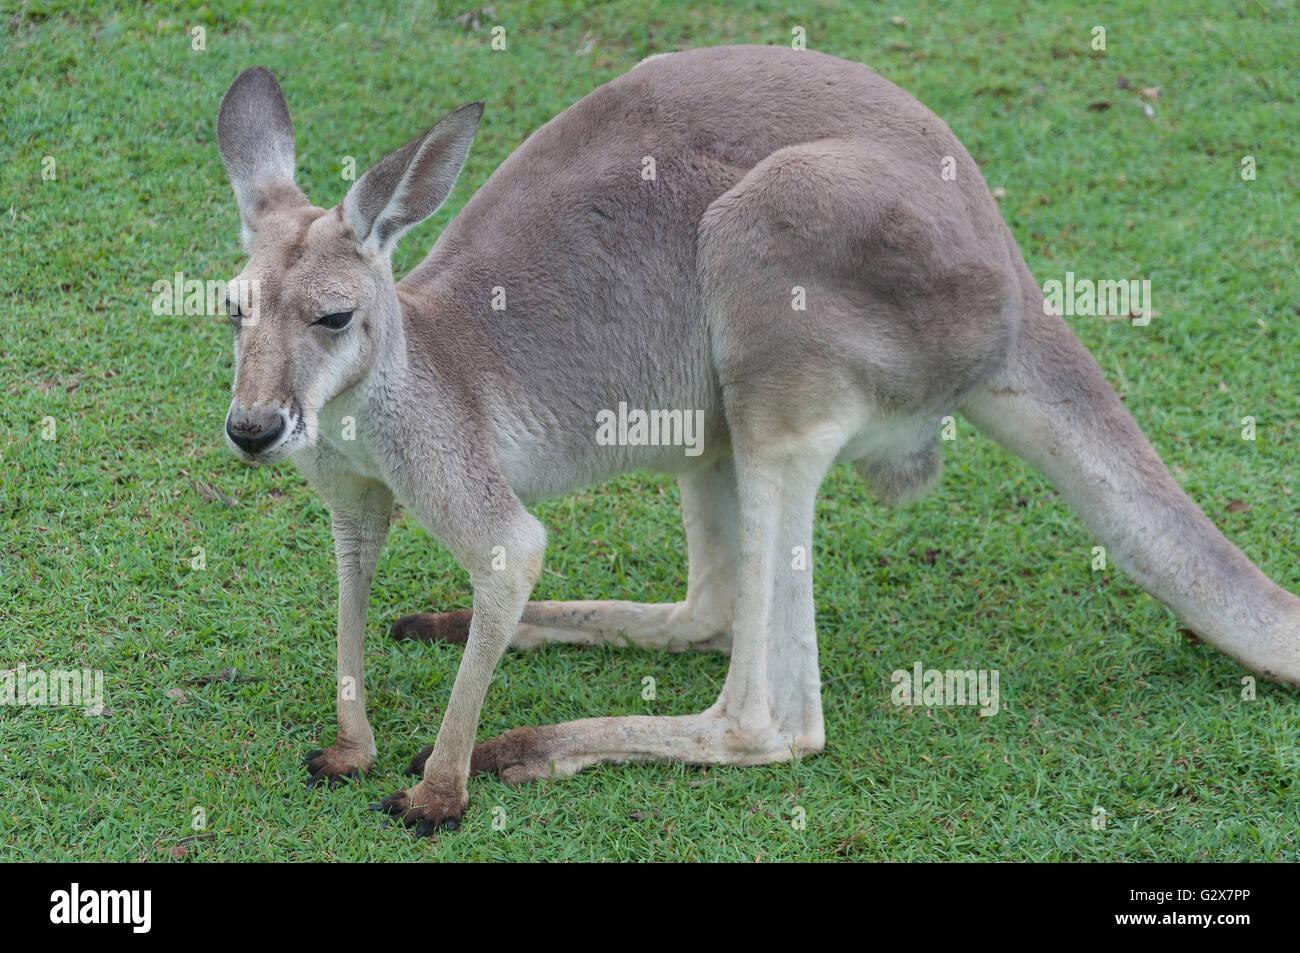 Western Grey Kangaroo at Lone Pine Koala Sanctuary, Fig Tree Pocket, Brisbane, Queensland, Australia - Stock Image